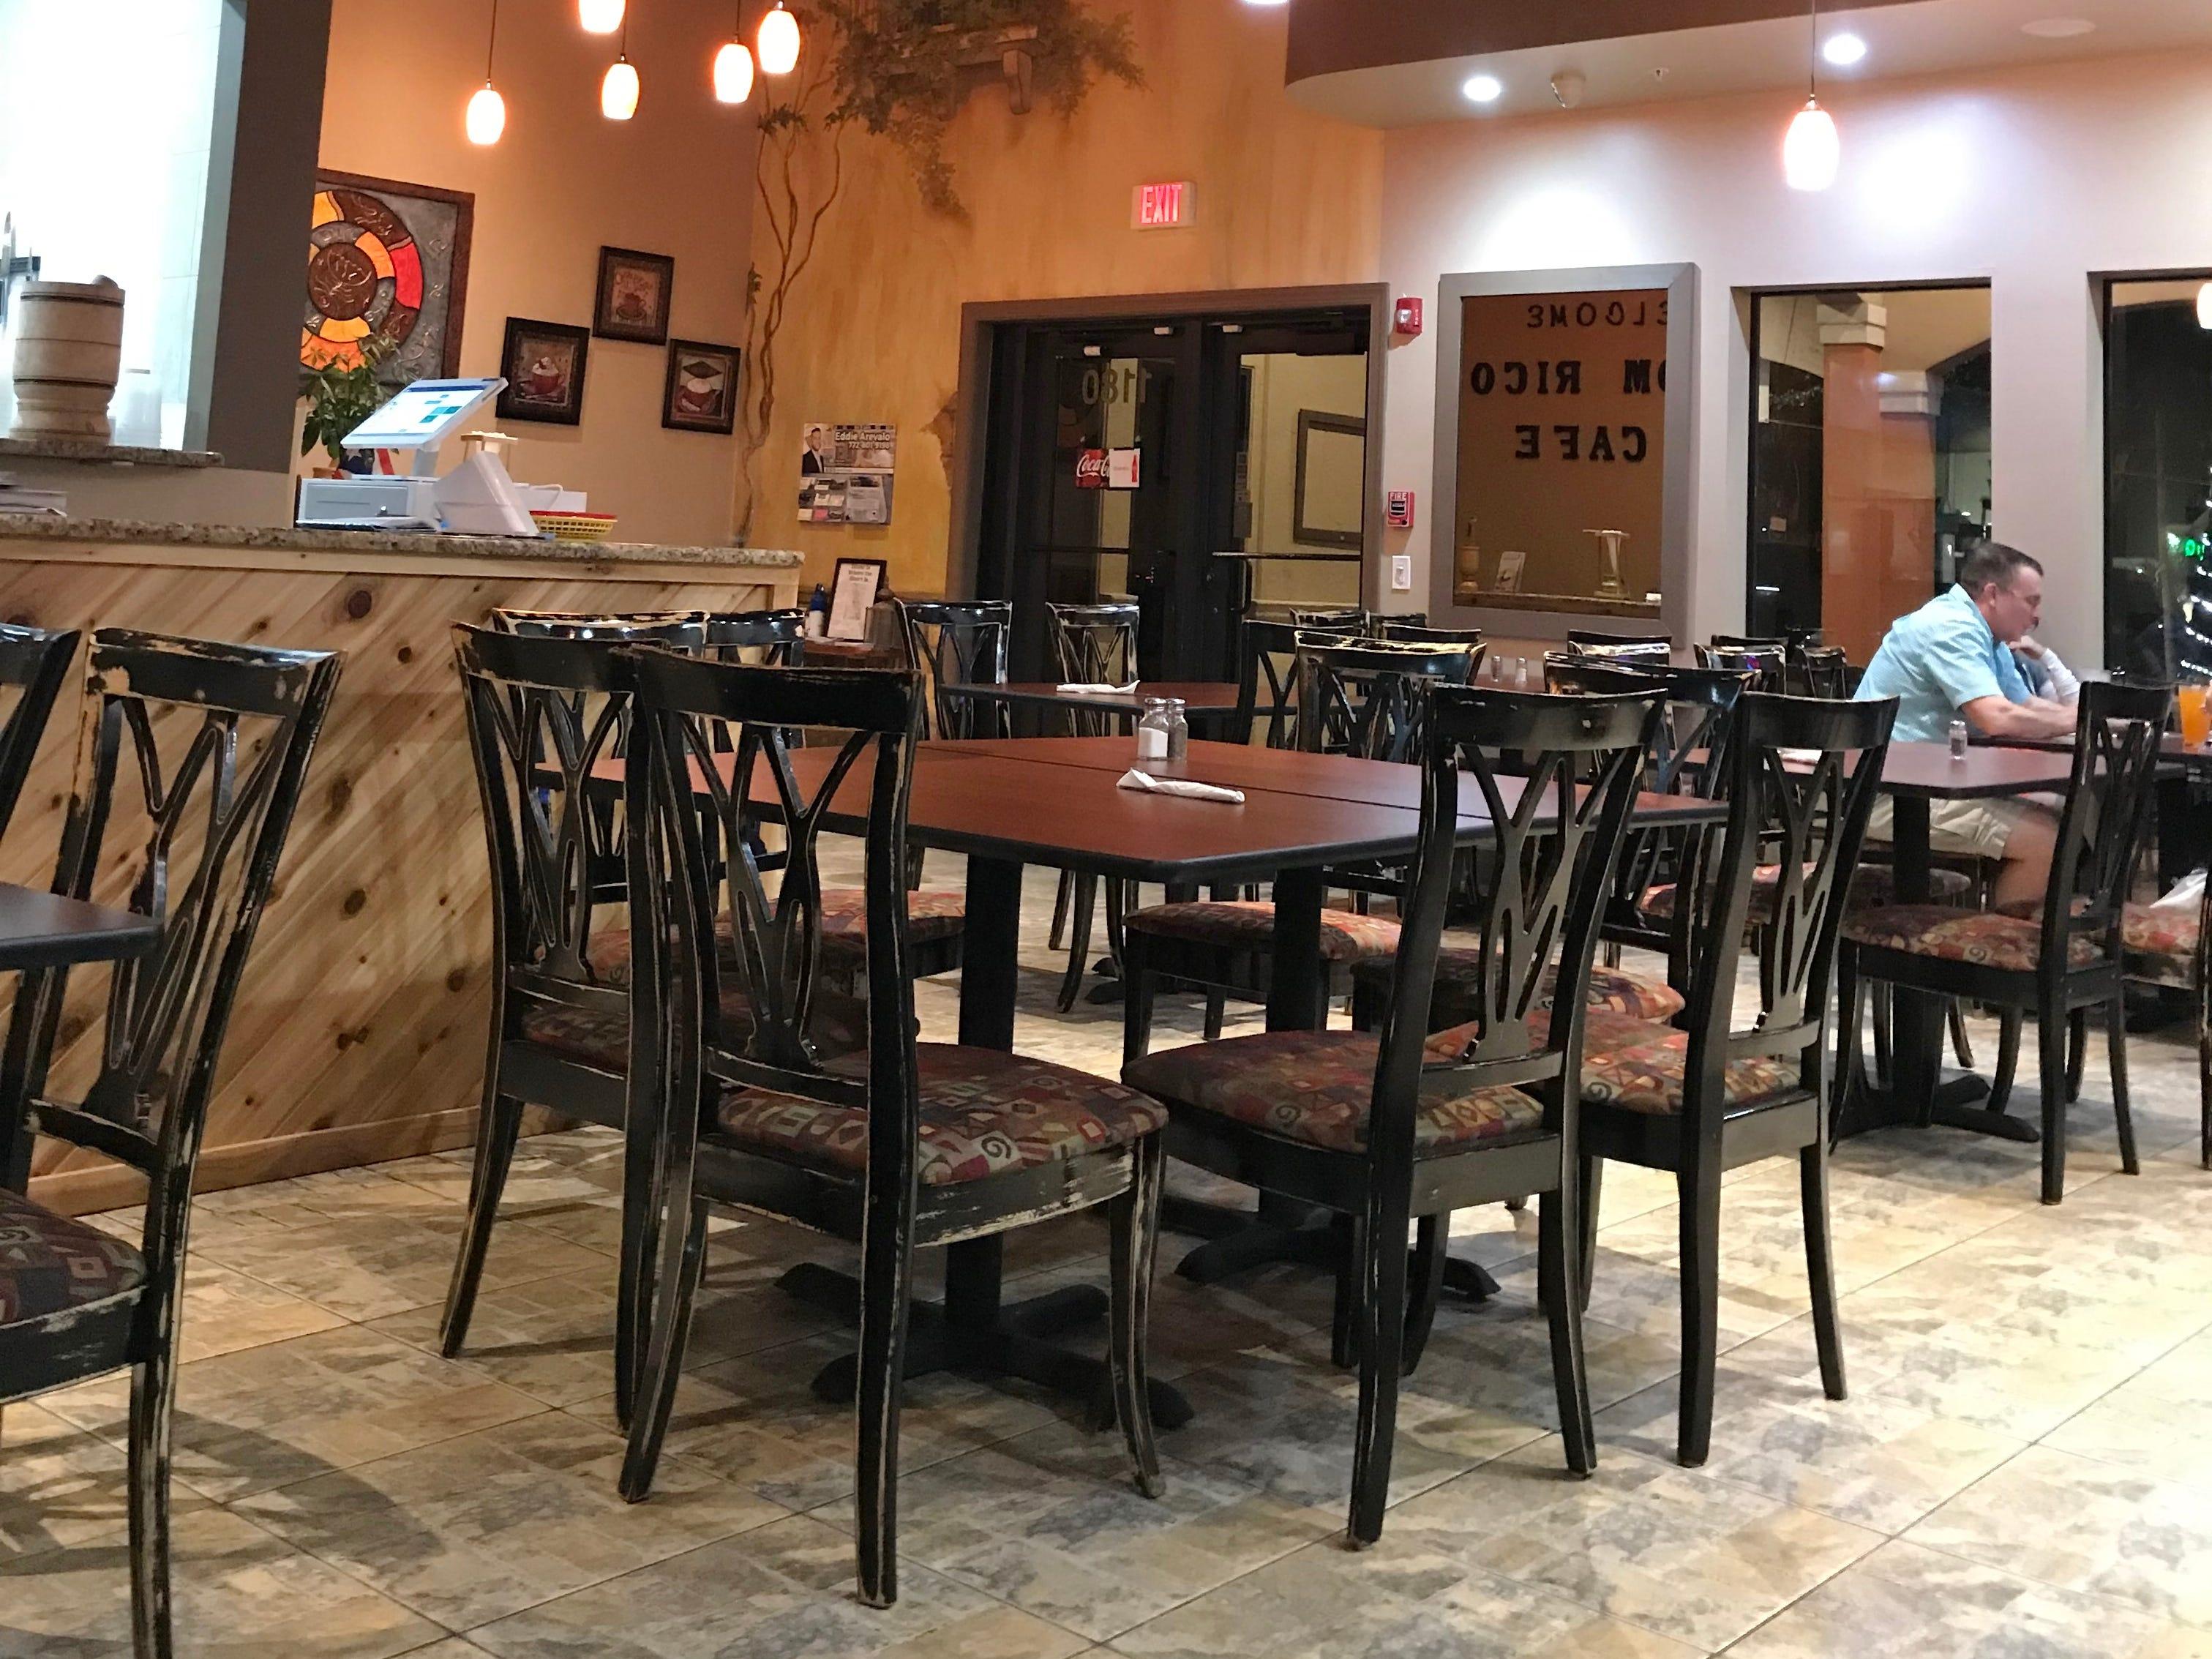 Dom Rico Cafe has a simple earth-tone decor.